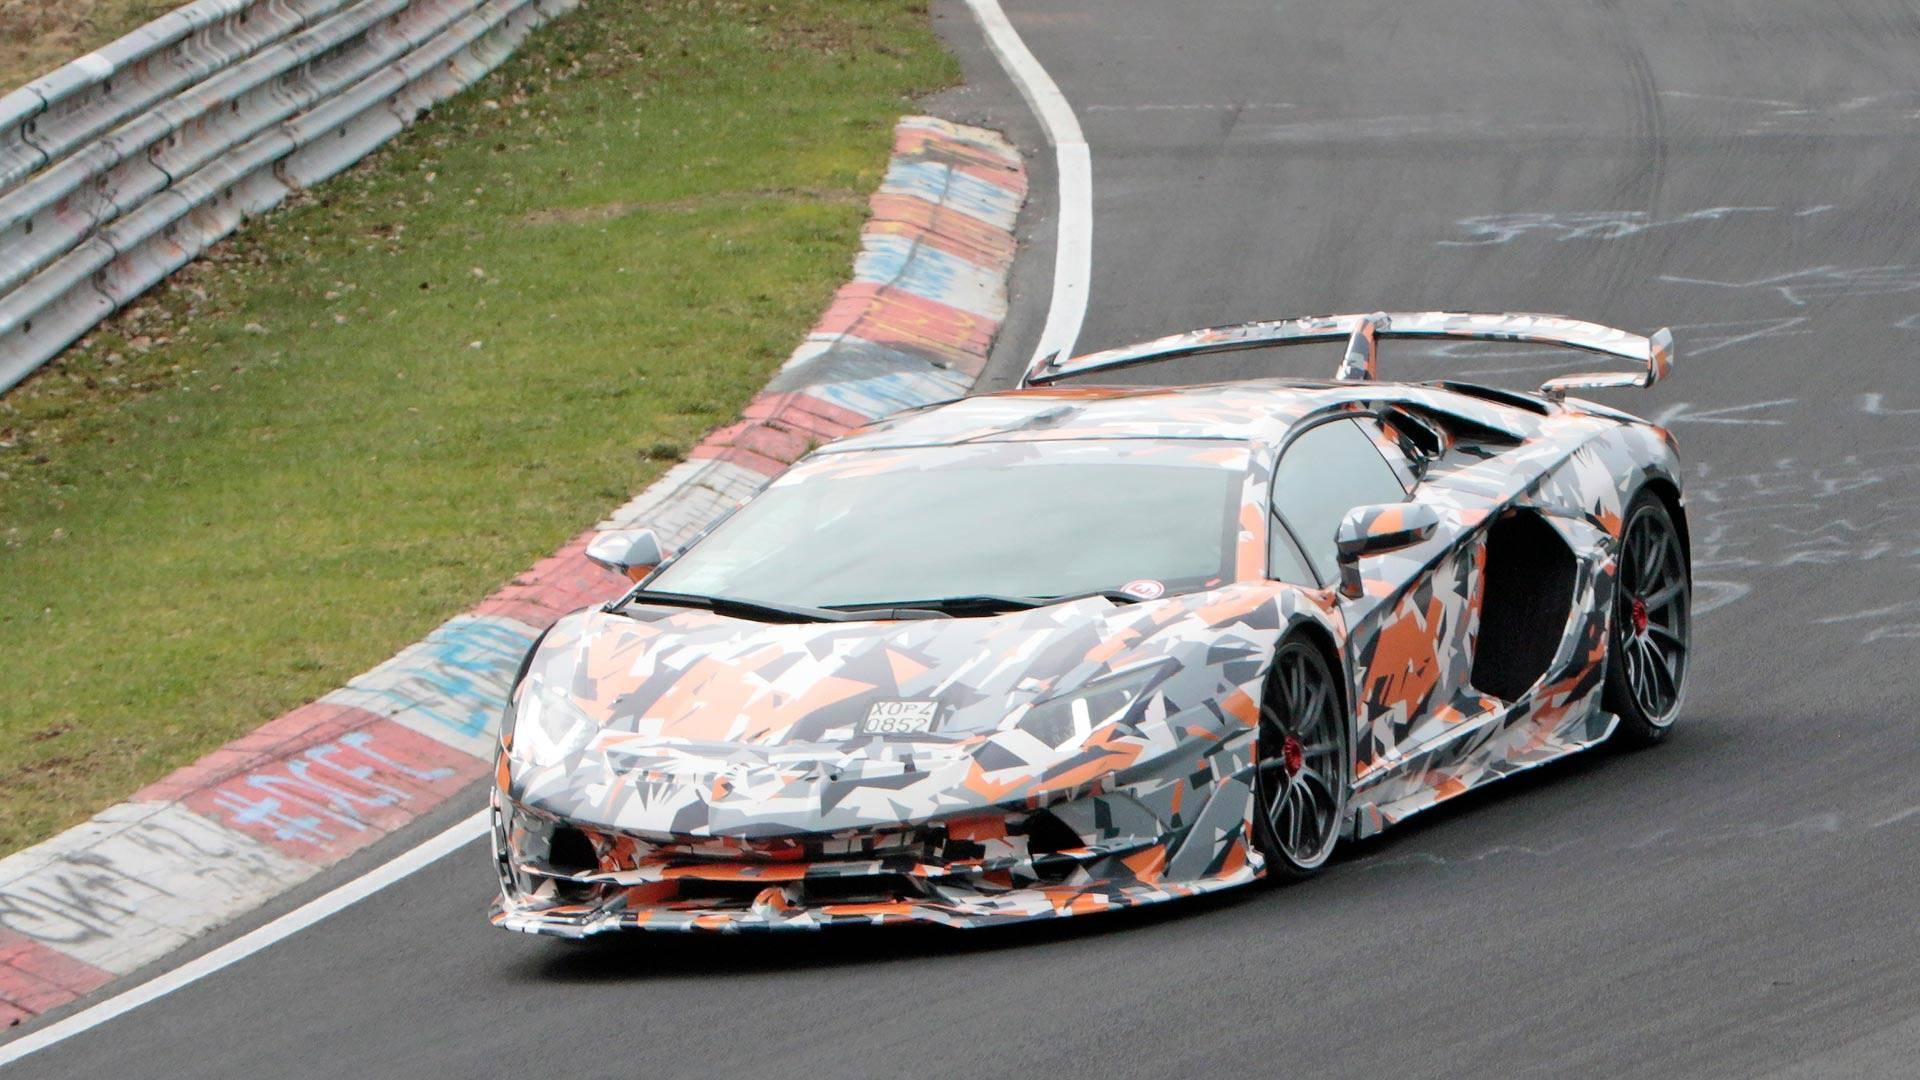 Aventador Svj Might Take Down 911 Gt2 Rs Nurburgring Record